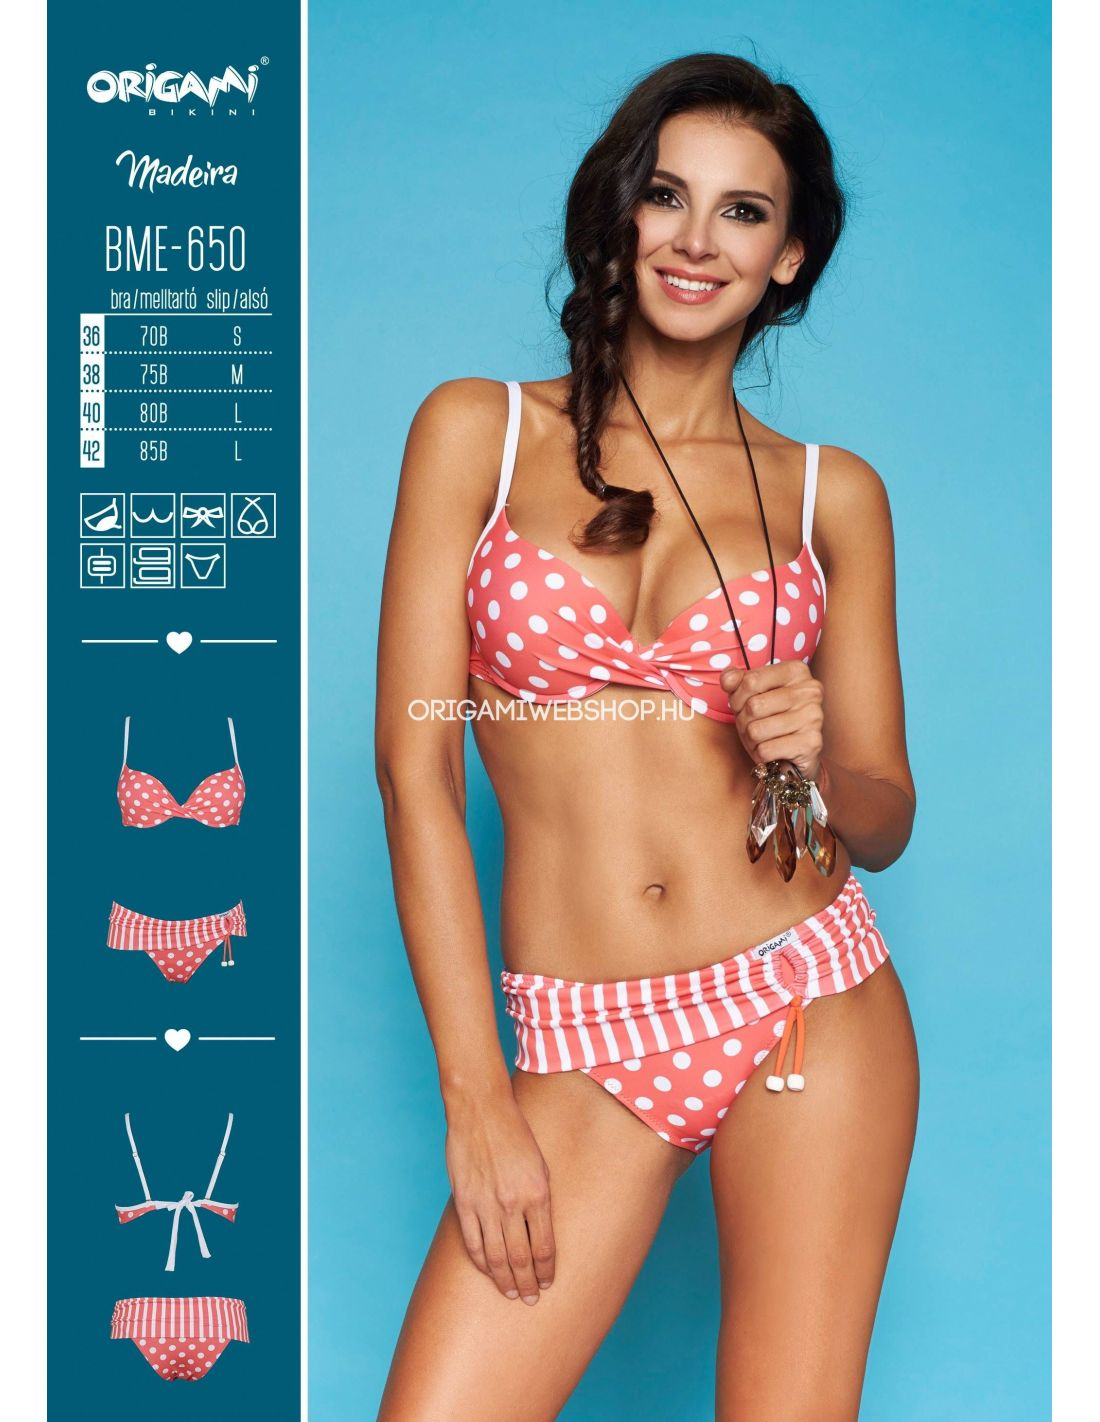 Origami Bikini BME-650 Madeira Méret 70B   S   36 316cc61067